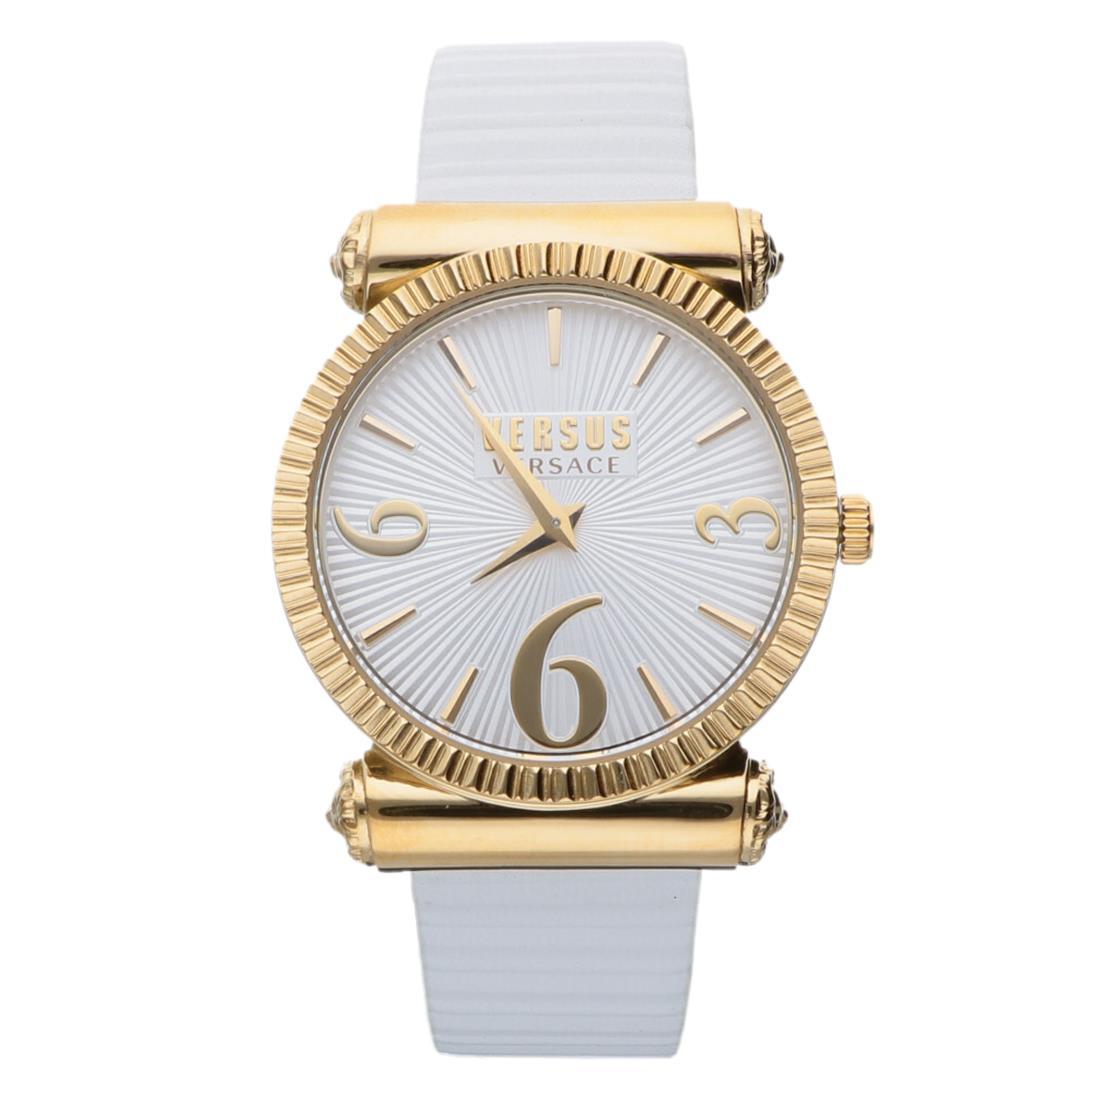 Reloj mujer caja 38mm - VERSUS